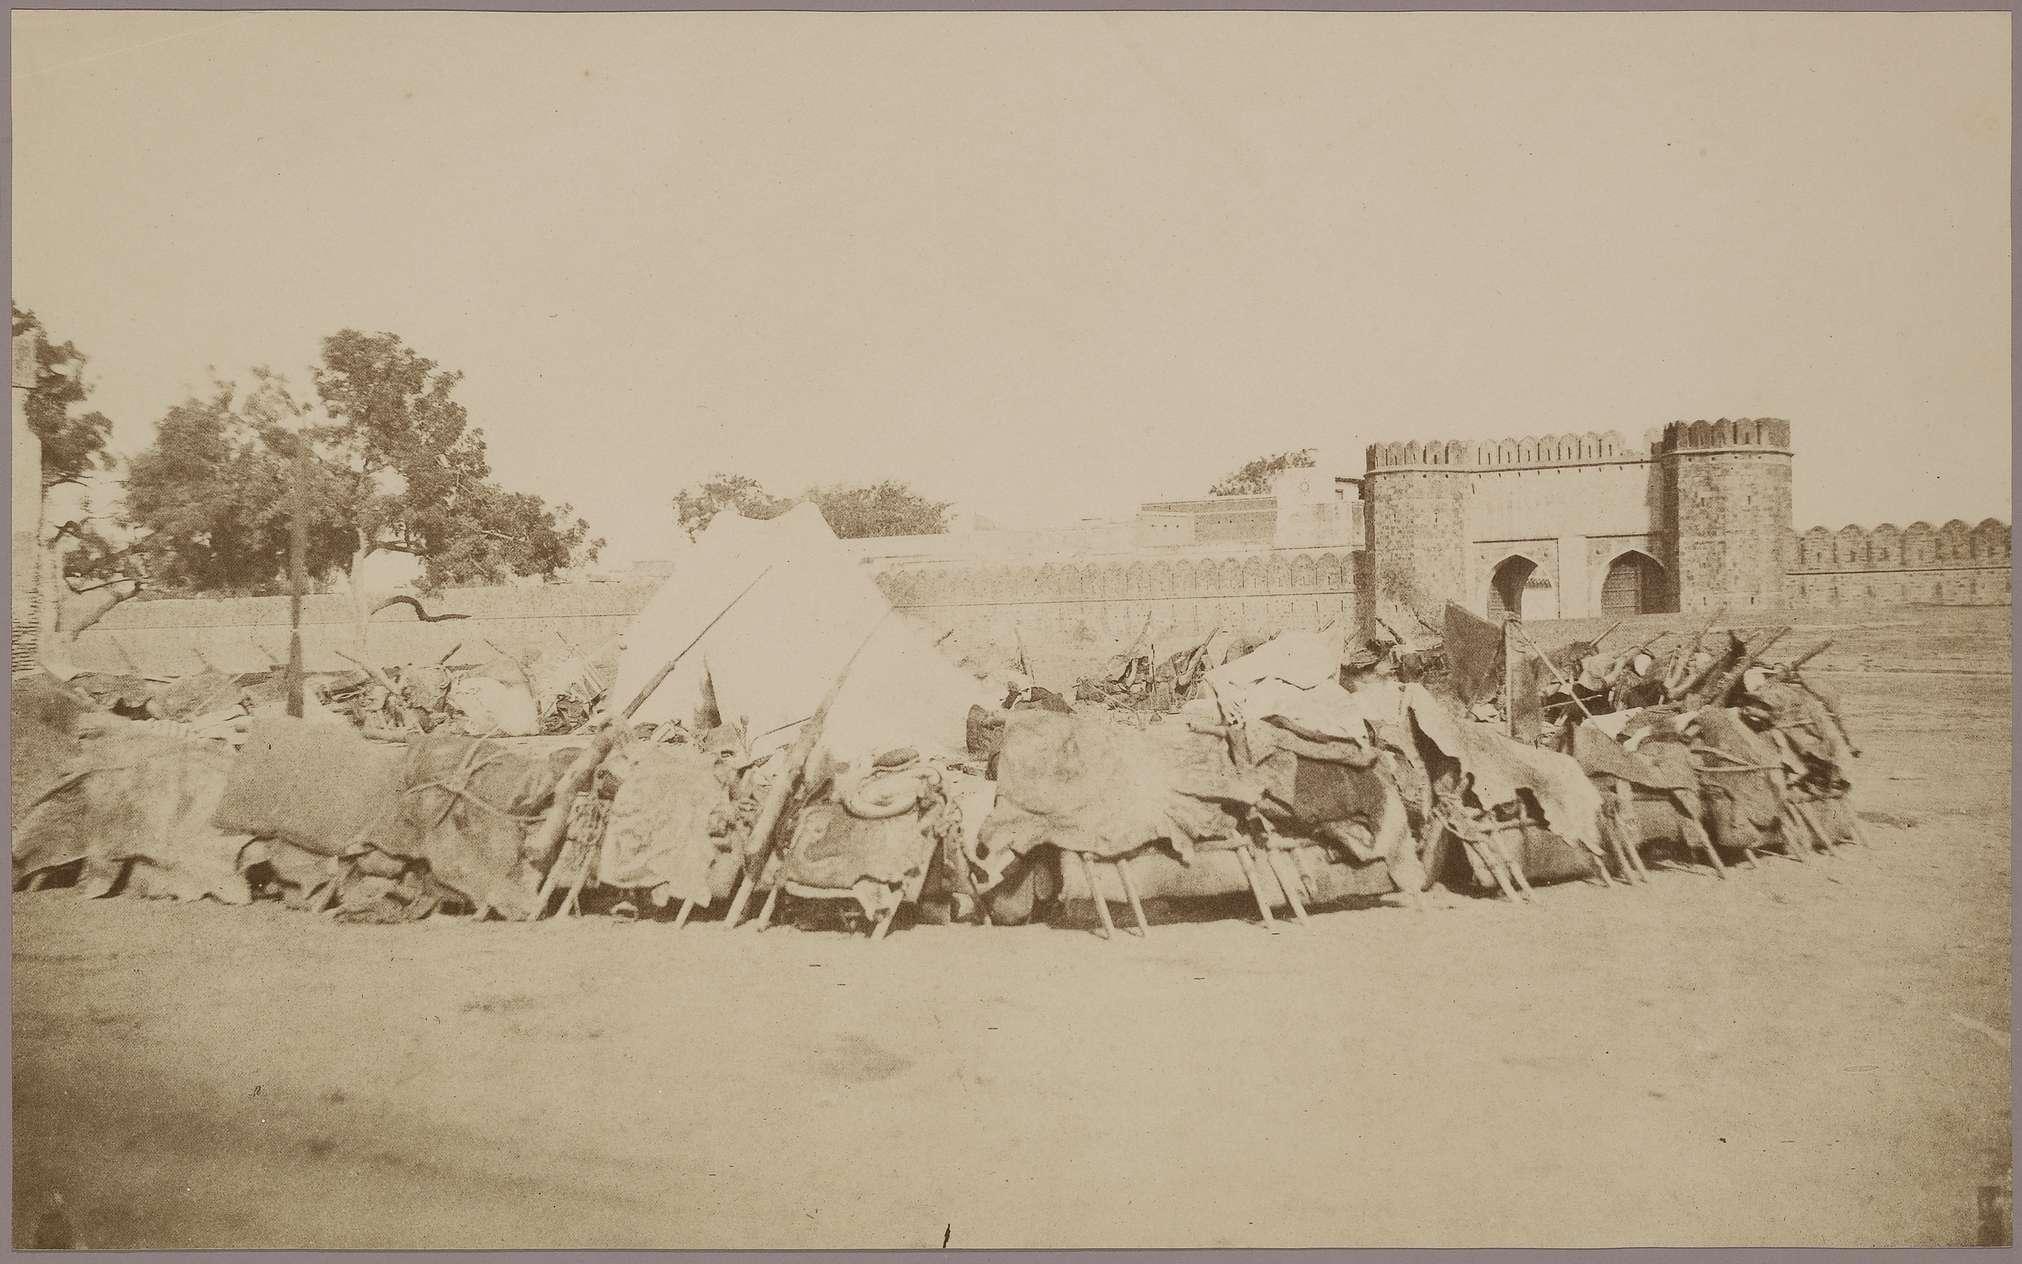 Lahore Gate of Delhi with Patiala Raja's Zumbruck (Camel Gun Encampment) - c.1857-1858